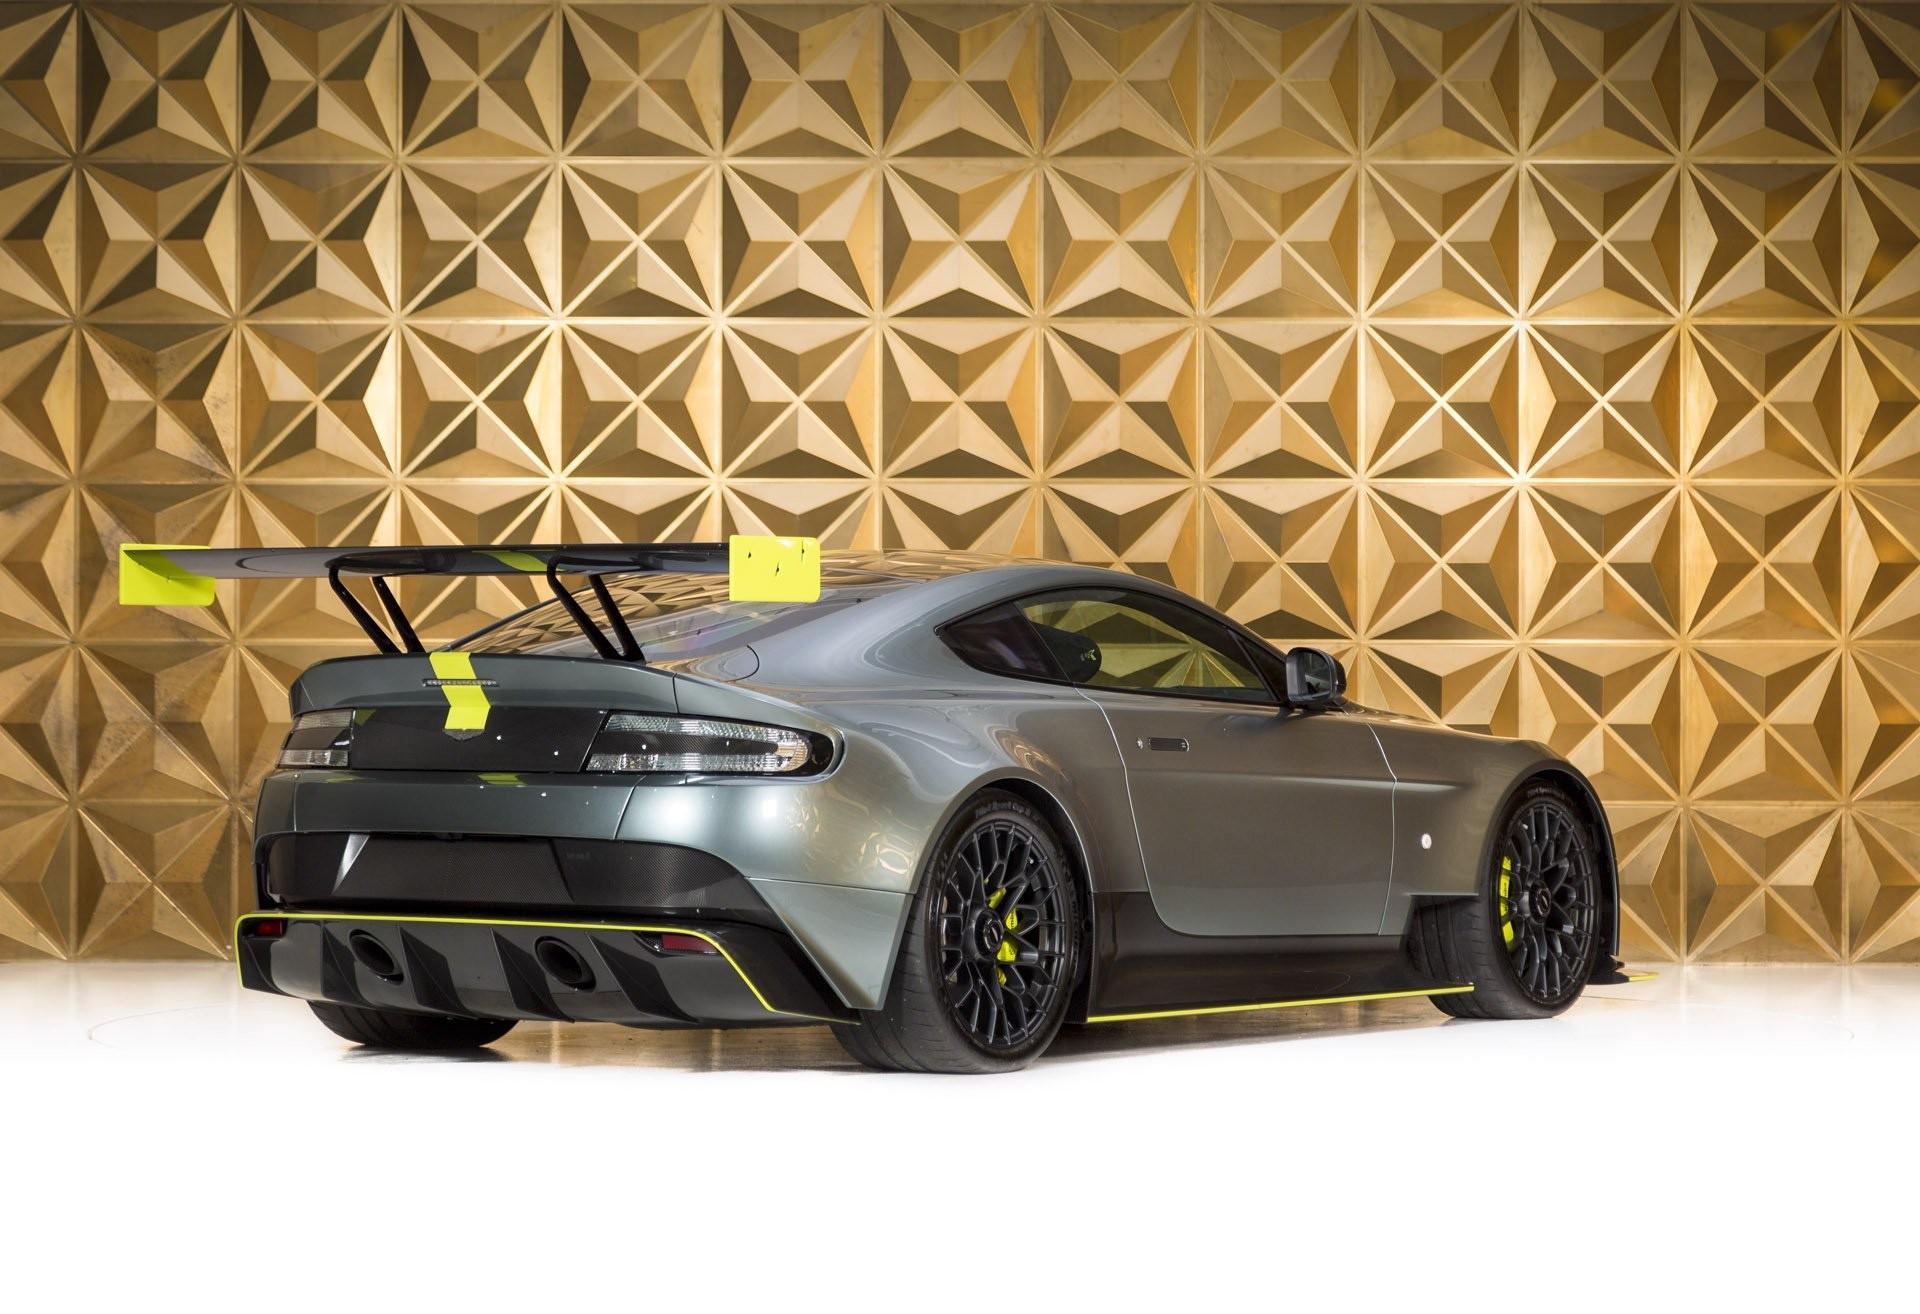 Aston_Martin_Vantage_AMR_Pro_sale-0001